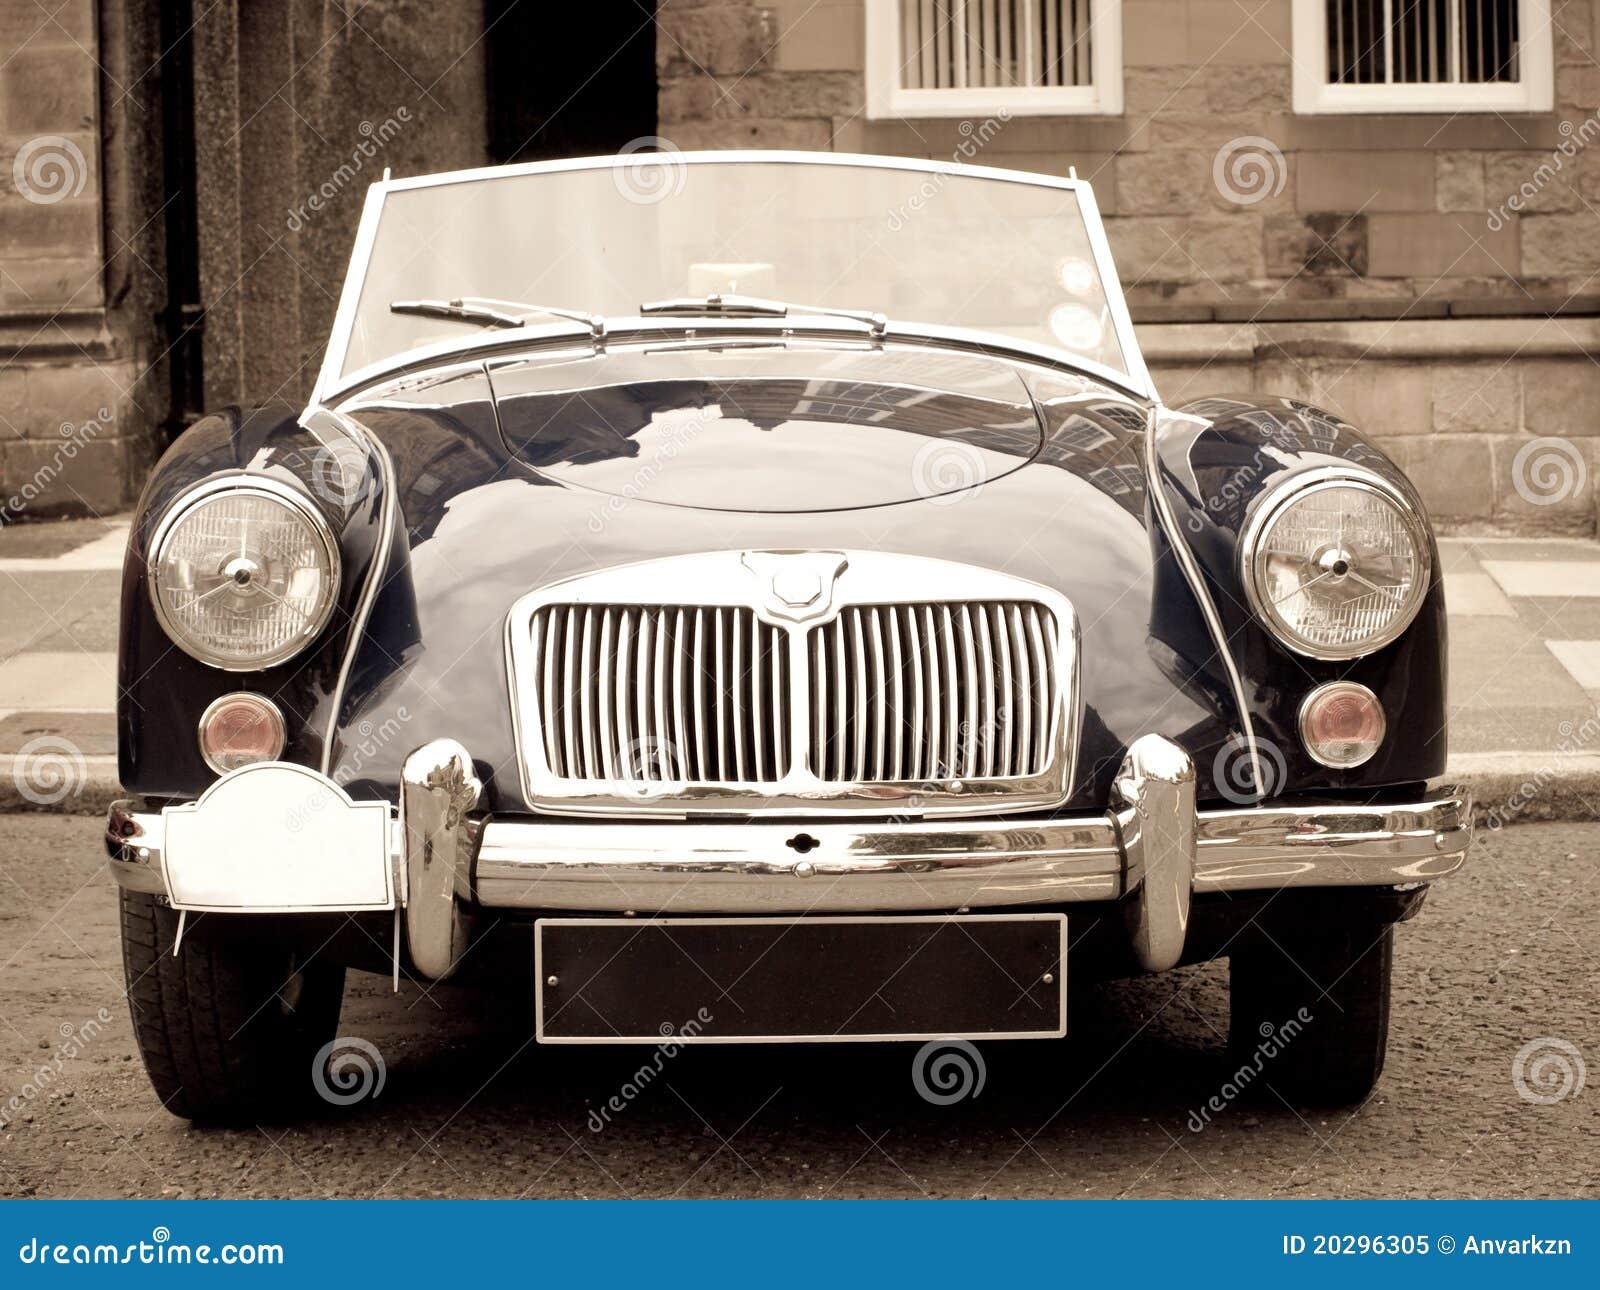 Vintage sport car on a car show.